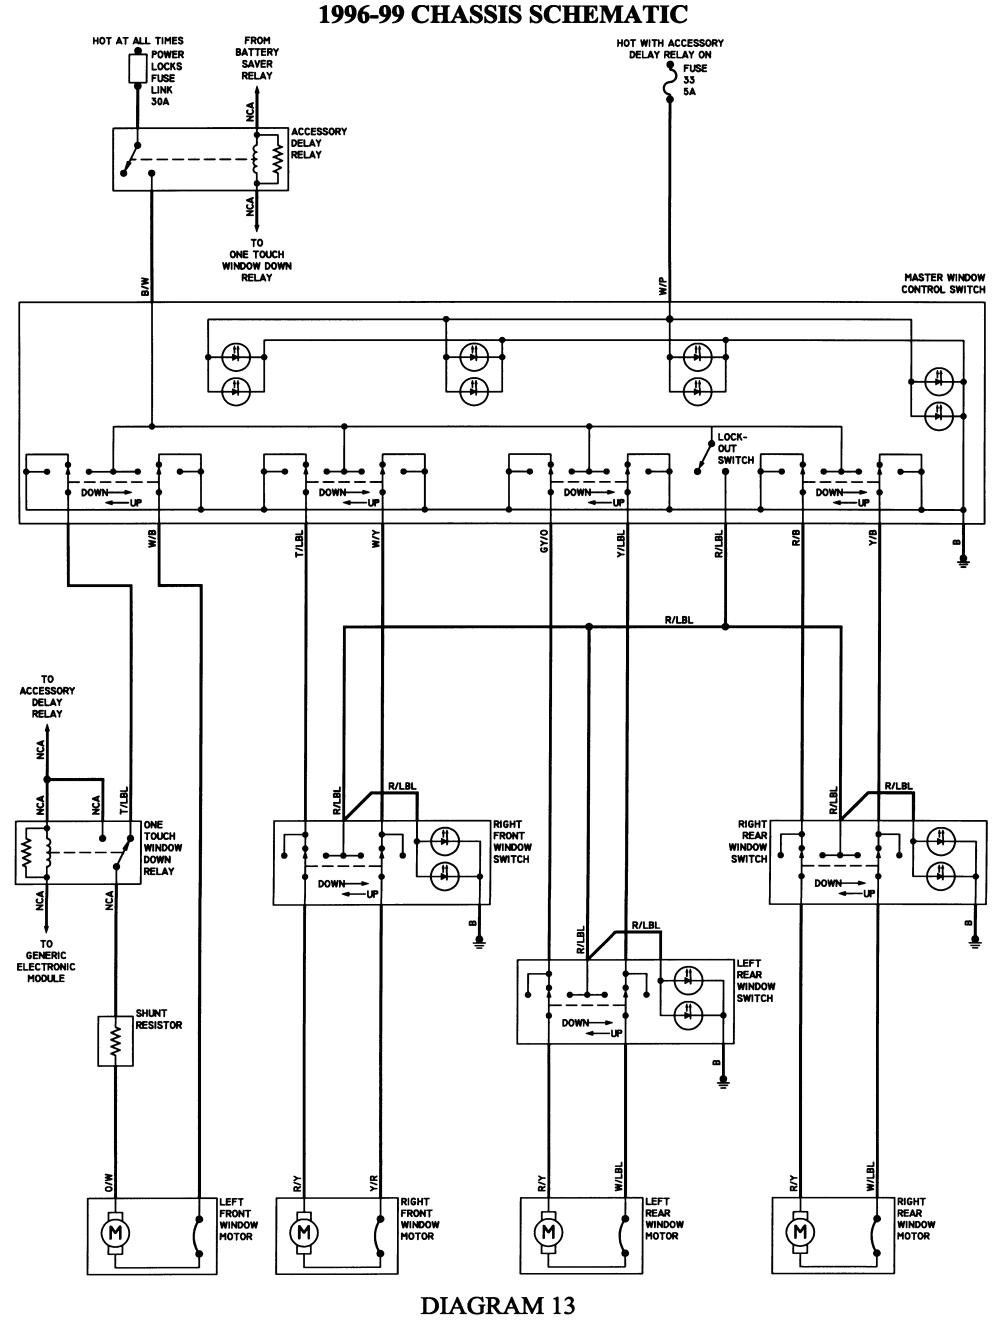 1999 ford Taurus Wiring Diagram ford Taurus Wiring Schematic Manual E Book